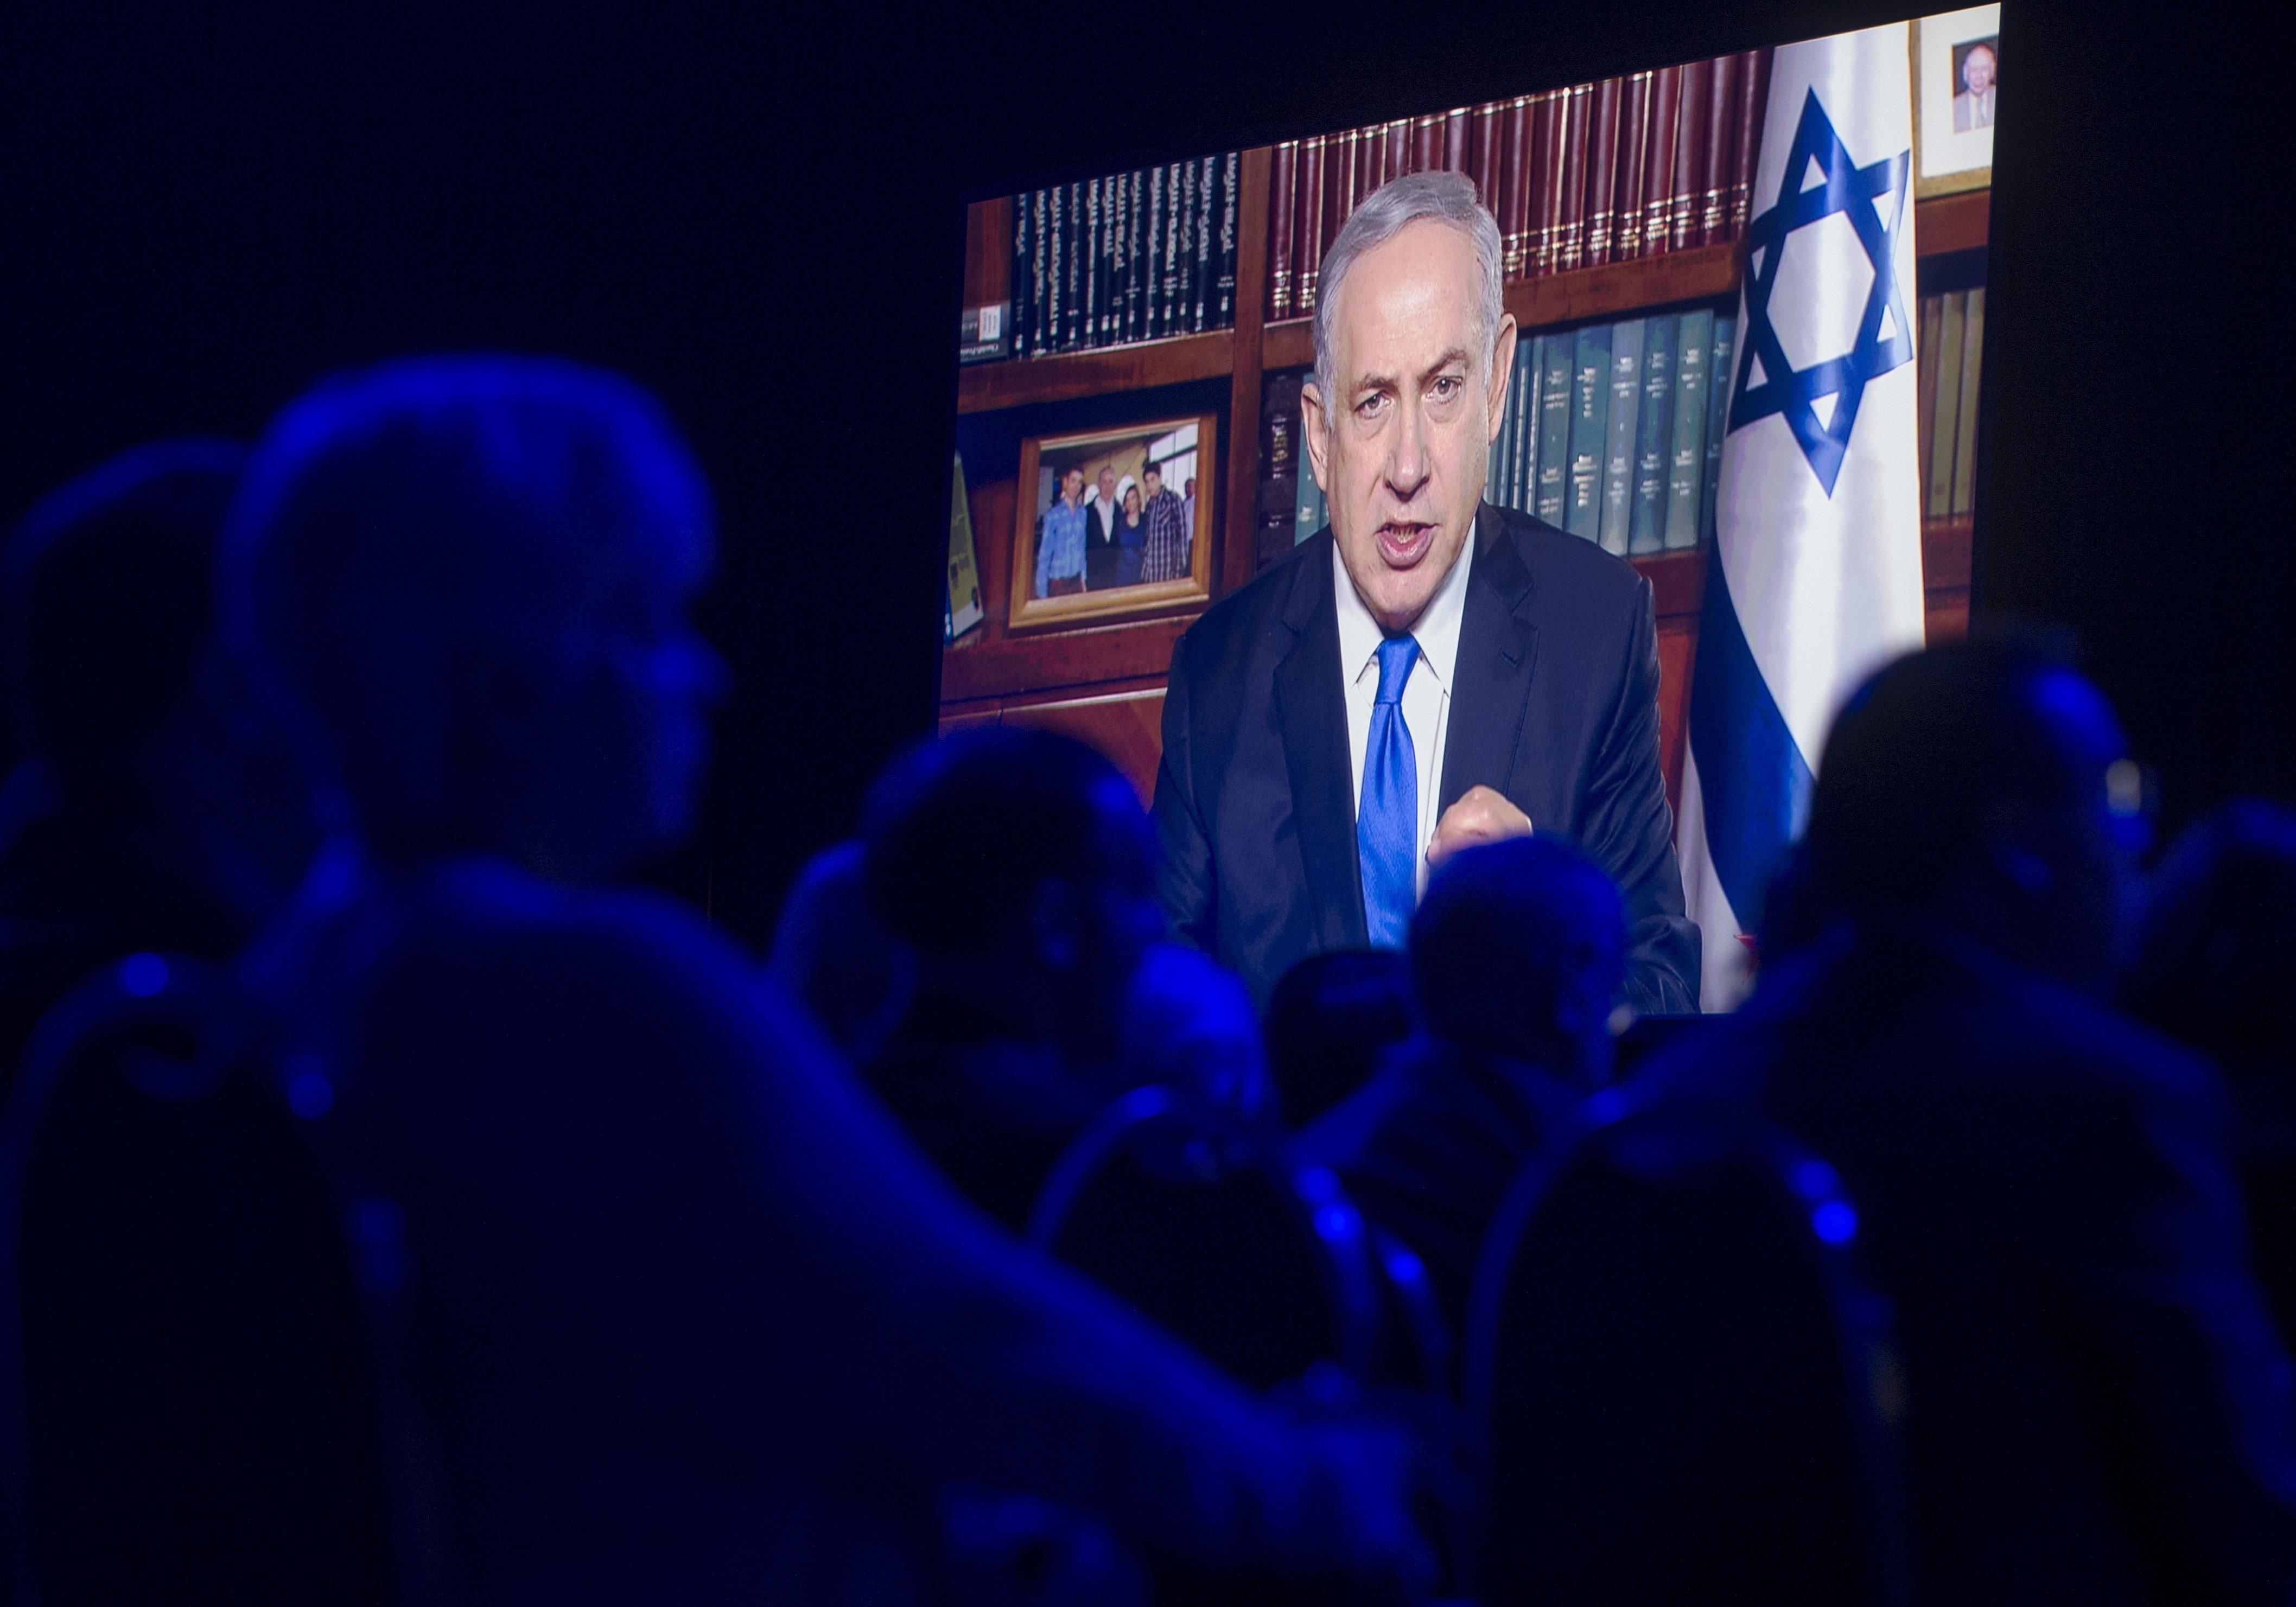 Israeli Prime Minister Benjamin Netanyahu speaks via a satellite television feed during the American Israel Public Affairs Co